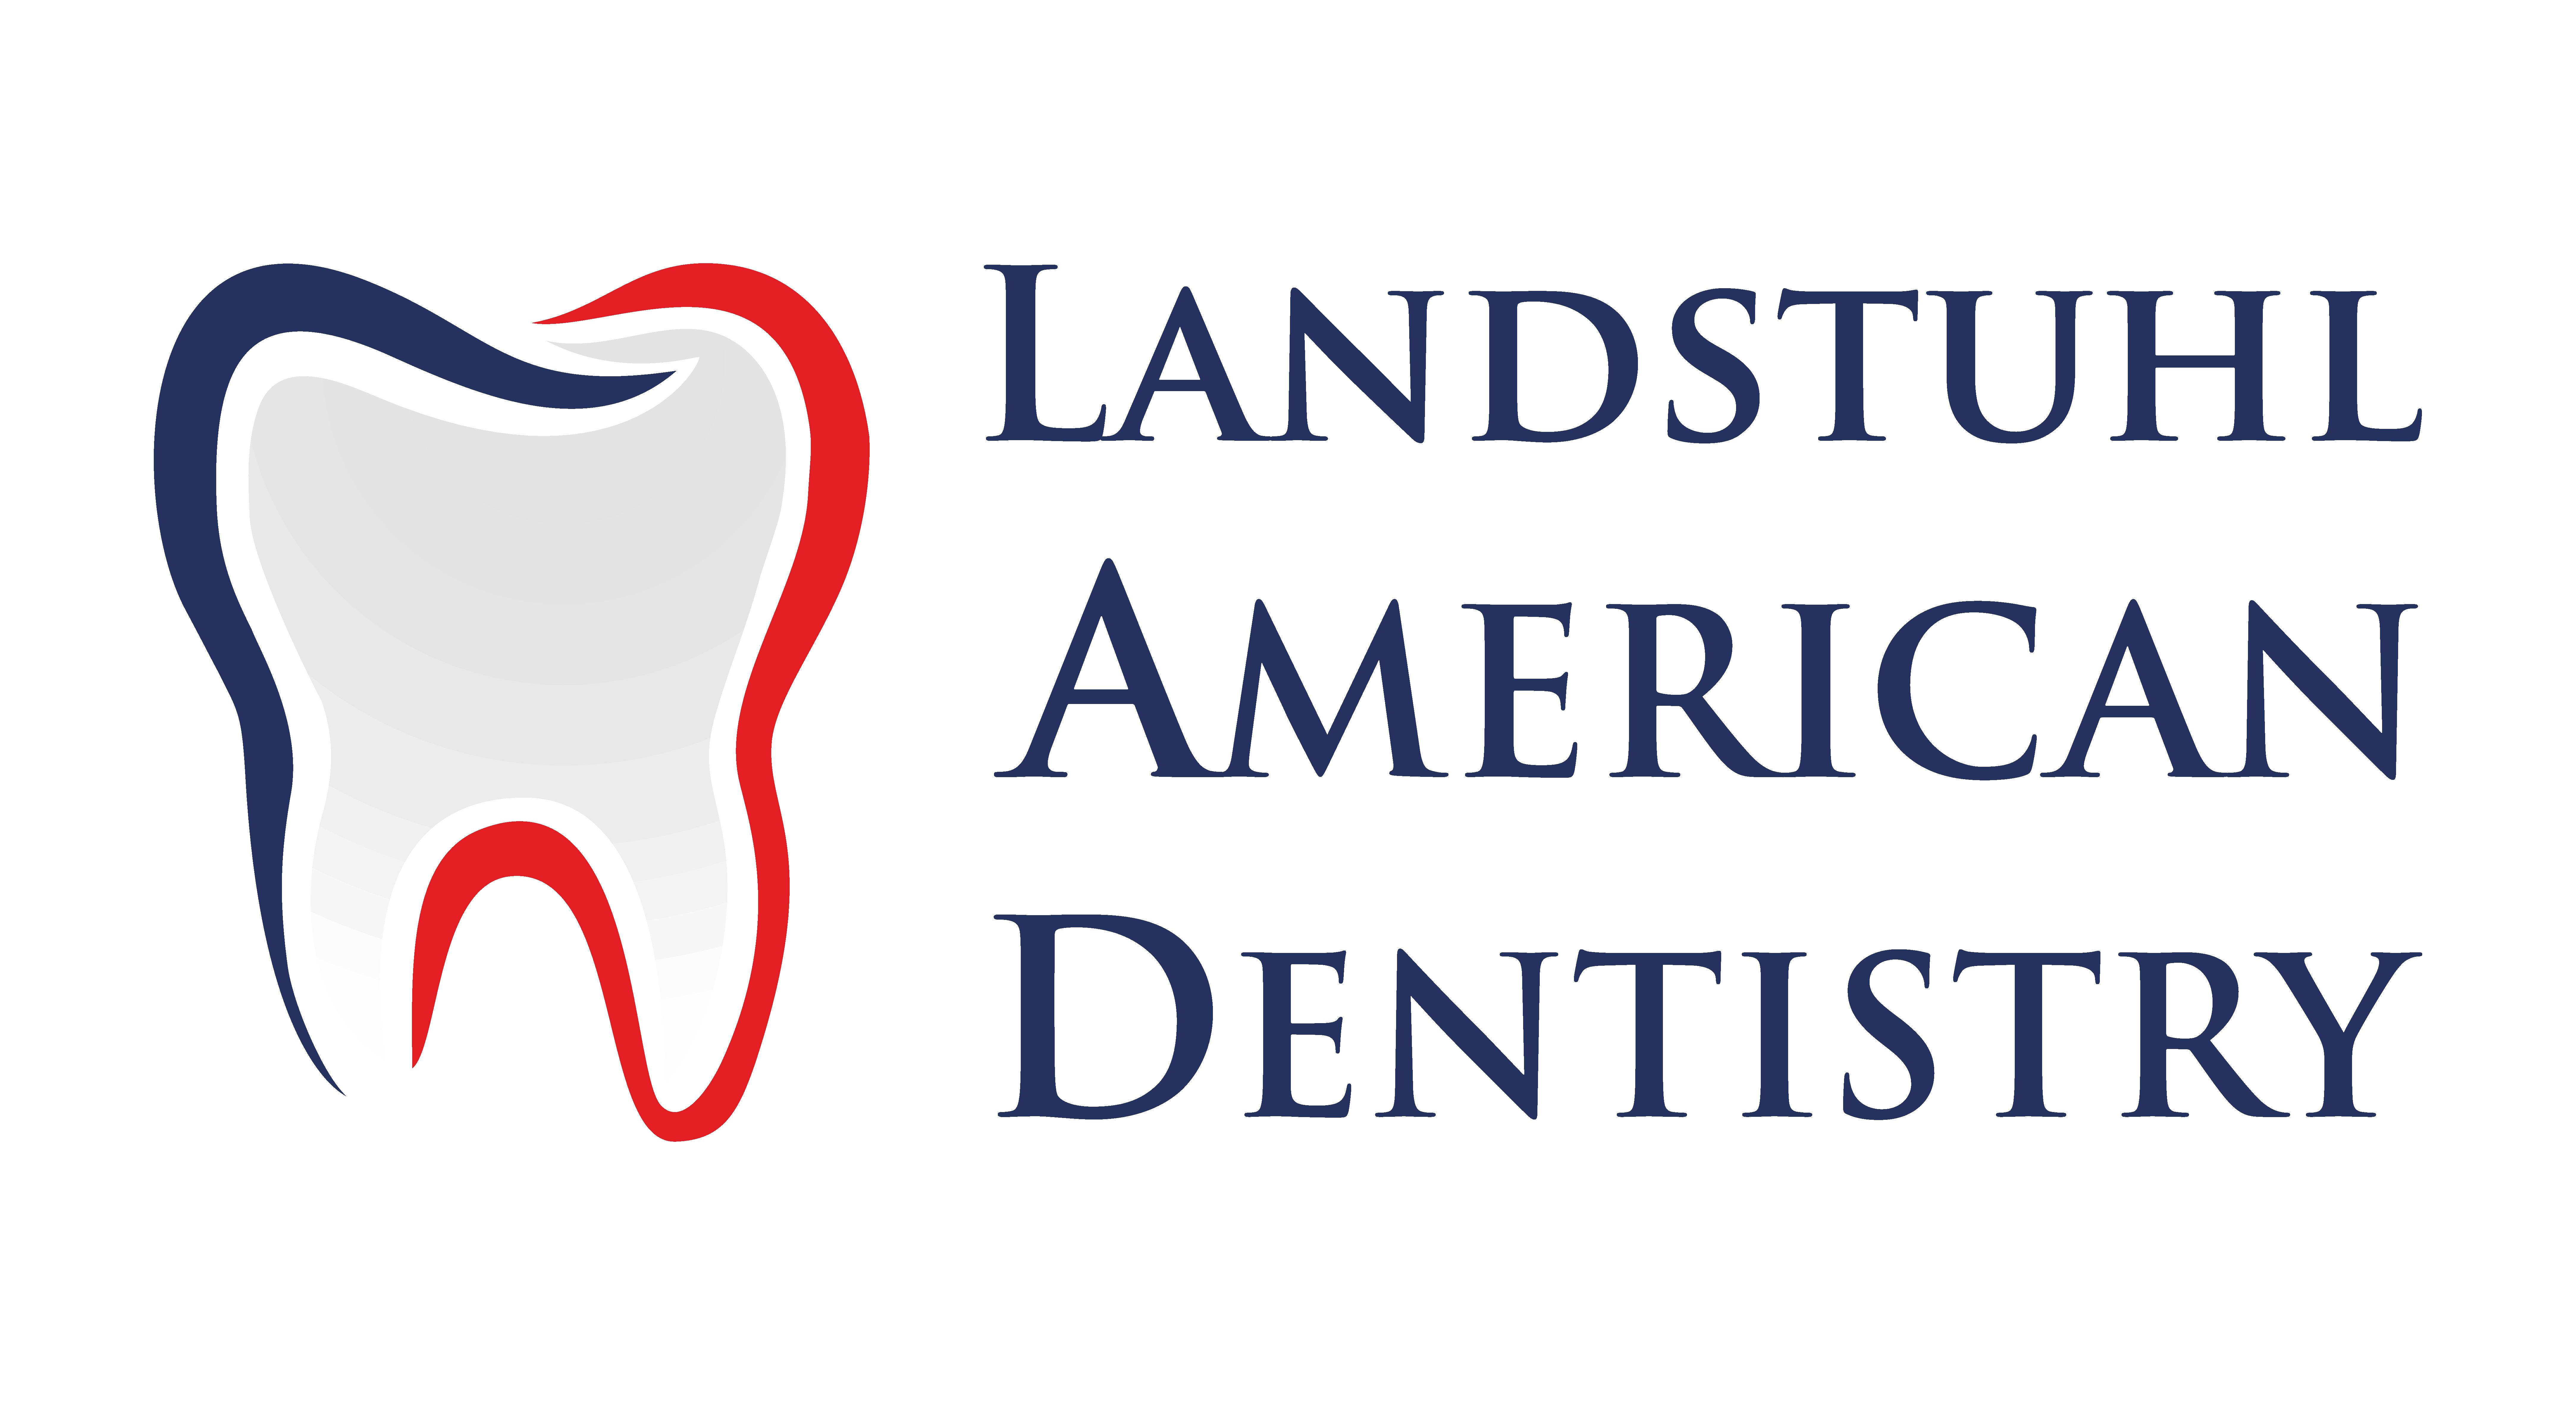 Landstuhl American Dentistry JPG.jpg